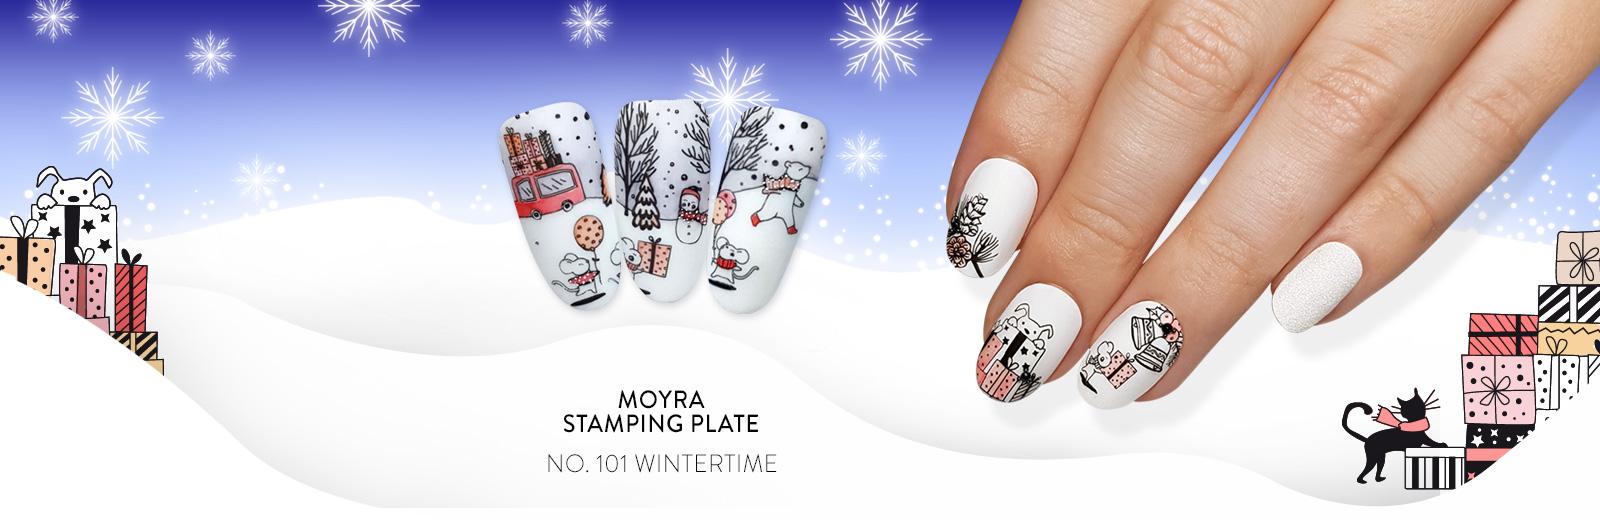 Moyra stamping plate 101 Wintertime Inspiration